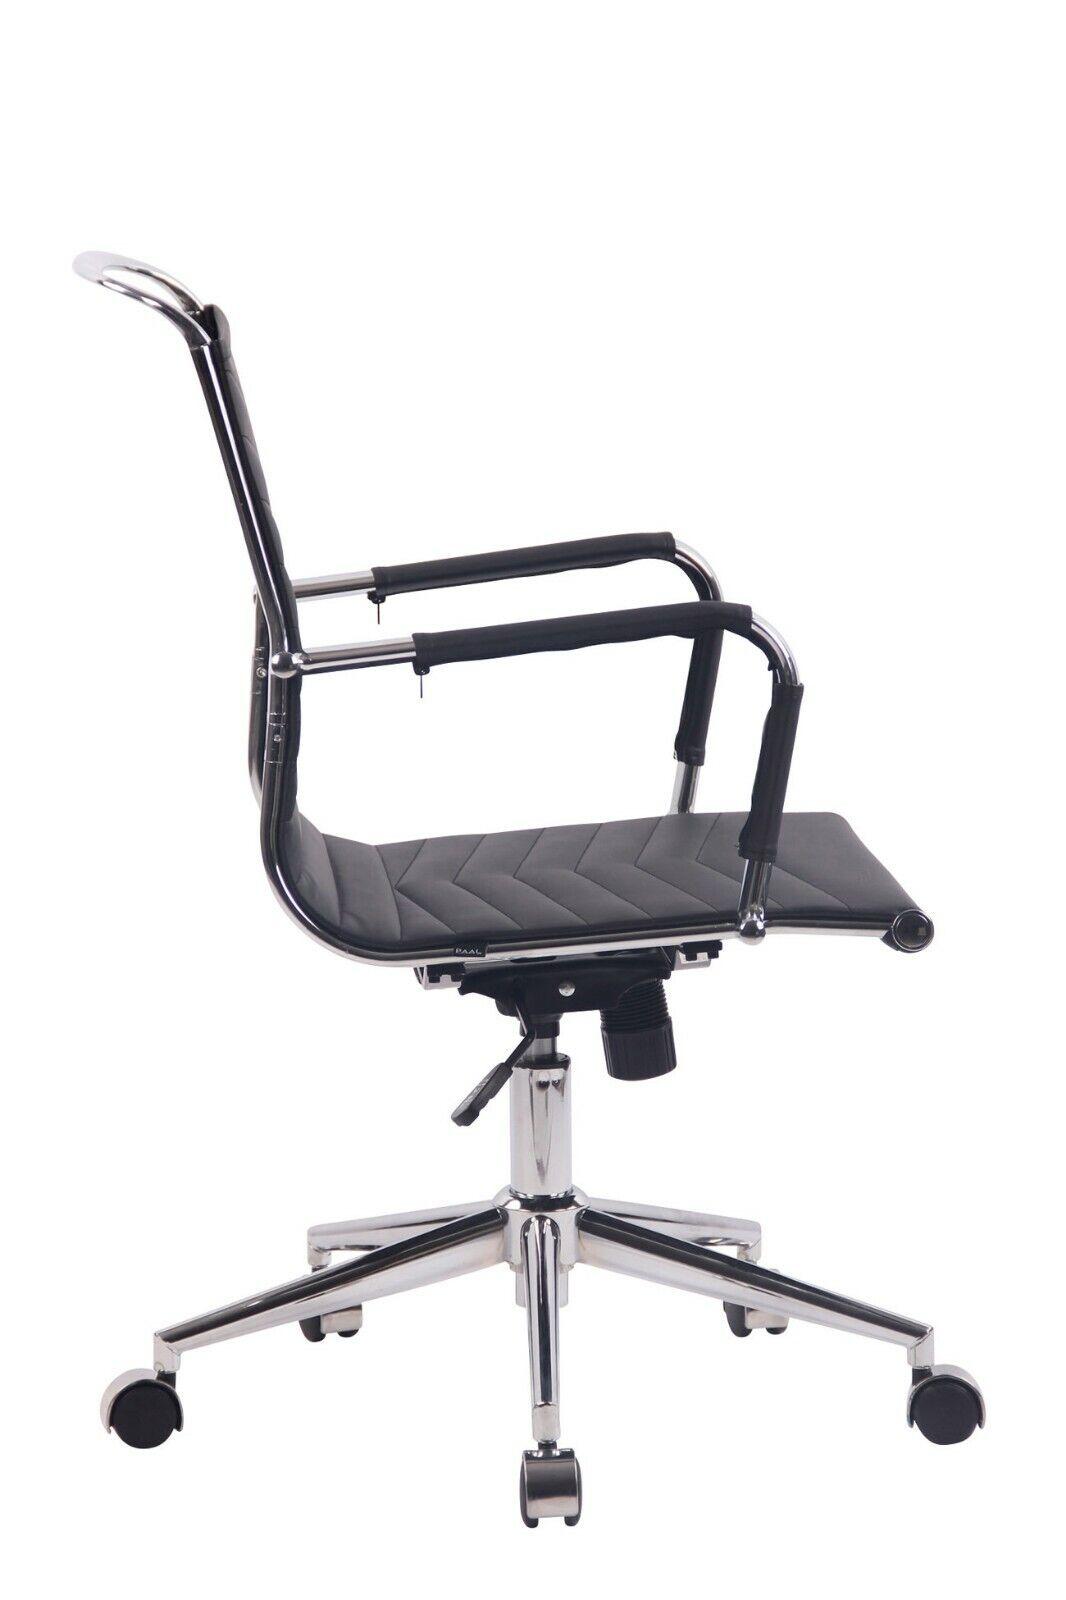 Drehstuhle Sessel Moderner Burostuhl Bis 136 Kg Belastbar Grau Chefsessel Design Hochwertig Neu Buro Schreibwaren Cur Aa Ufl Edu